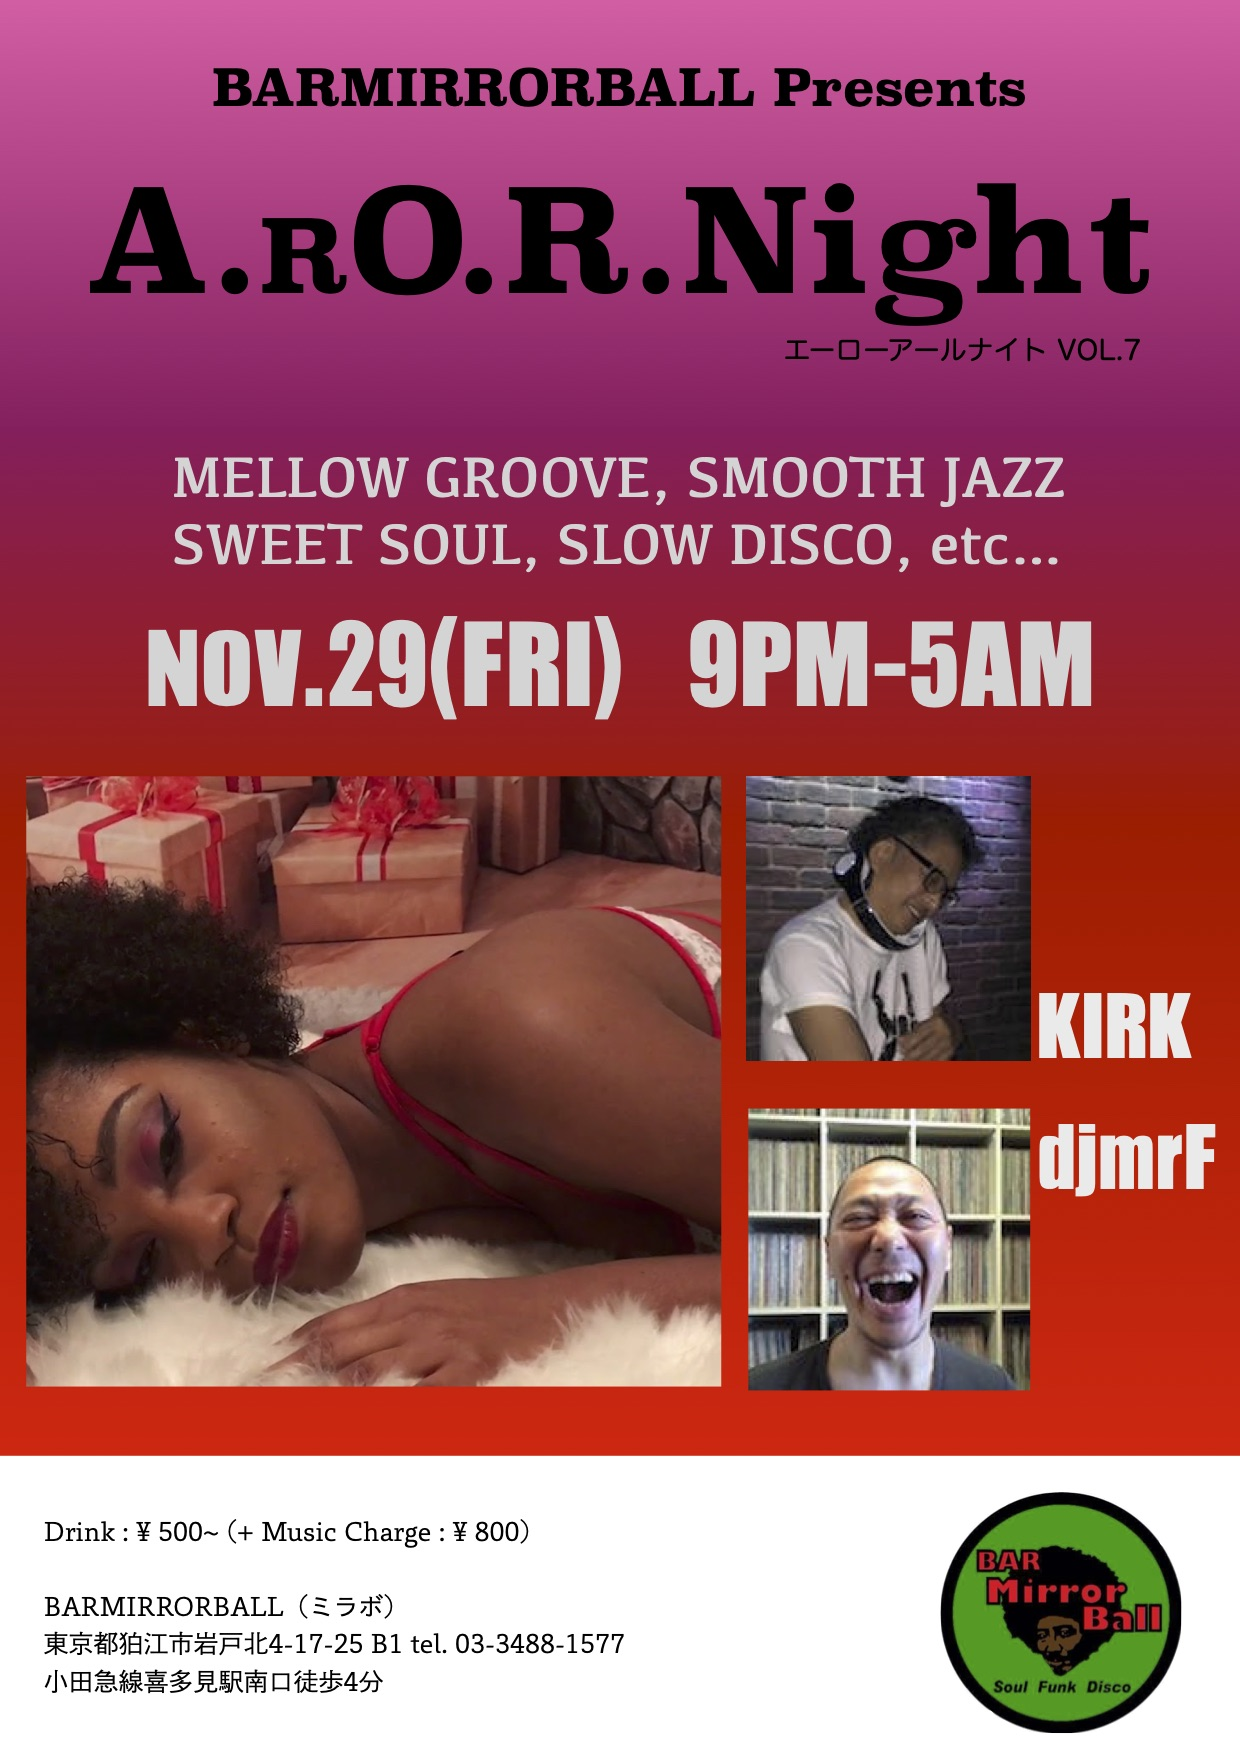 A.Ro.R.Night VOL.7 [2019/11/29]